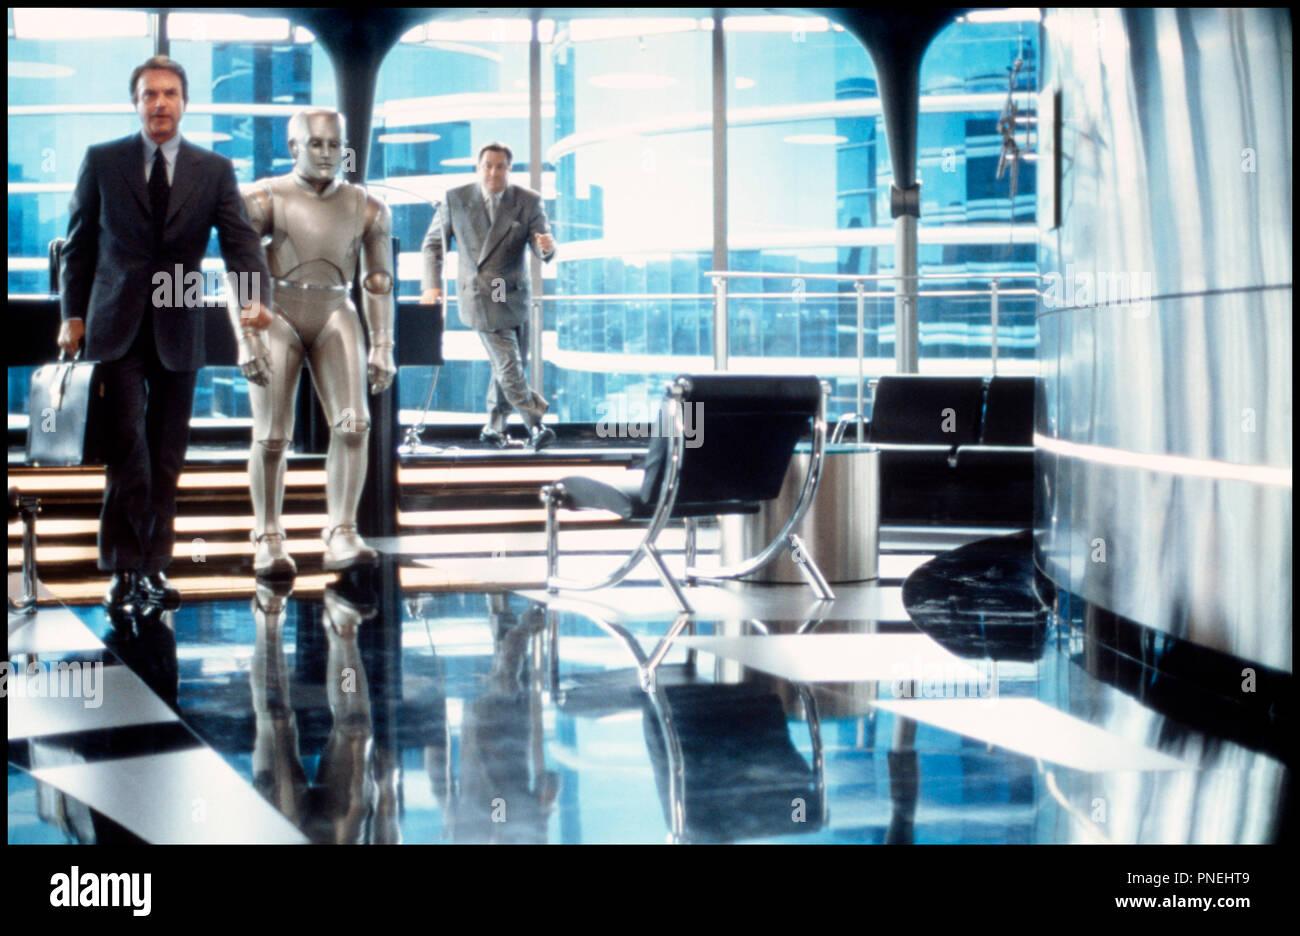 Prod DB © Columbia / DR L'HOMME BICENTENAIRE (BICENTENNIAL MAN) de Chris Columbus 1999 USA avec Sam Neill et Robin Williams robot,  d'apres le roman de Isaac Asimov - Stock Image